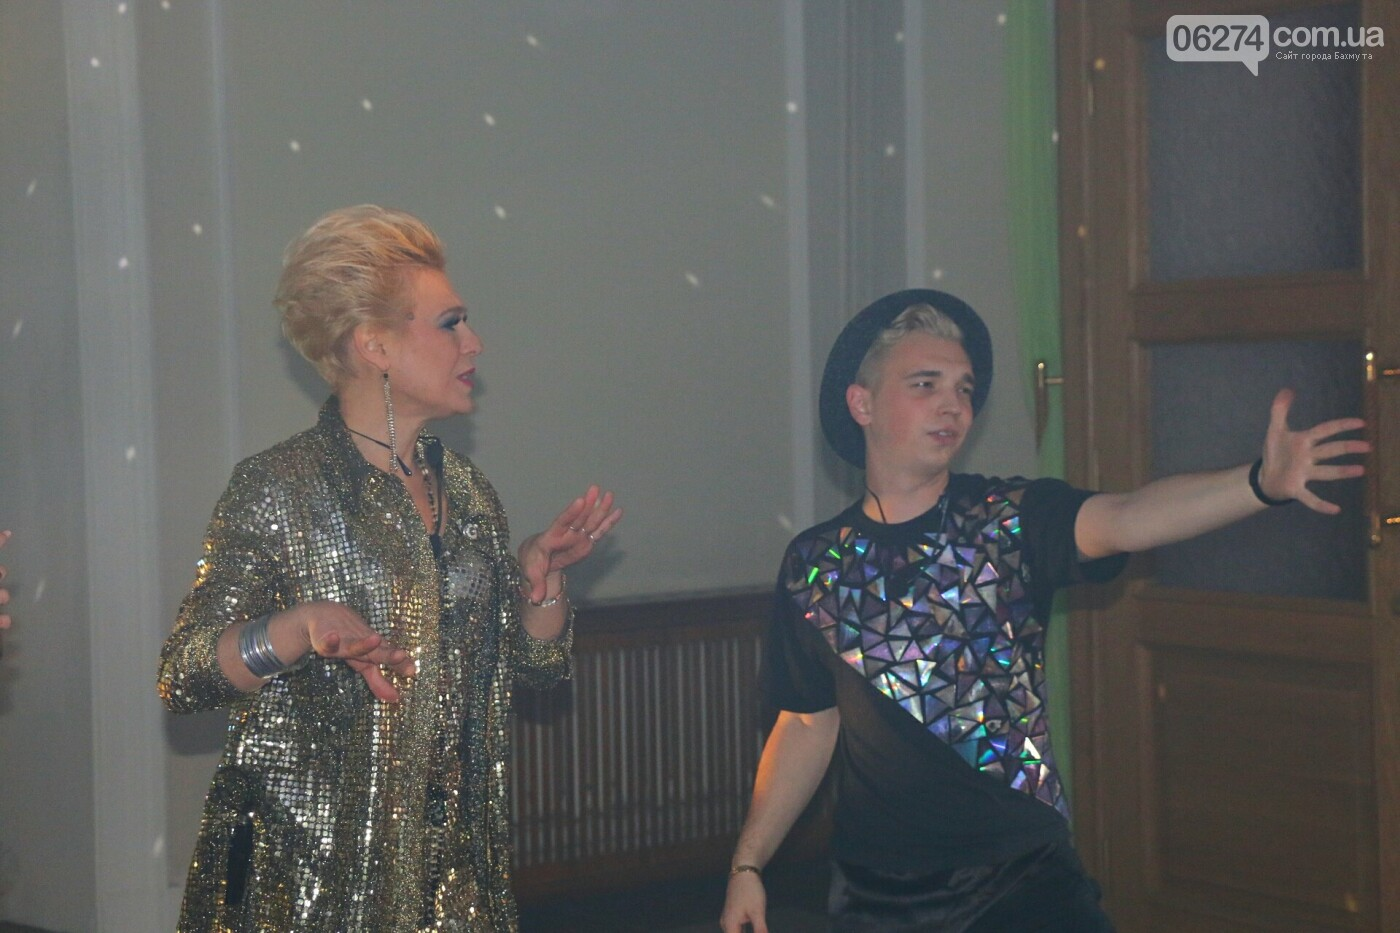 В Бахмуте провели Disco House Party (ФОТООТЧЕТ), фото-40